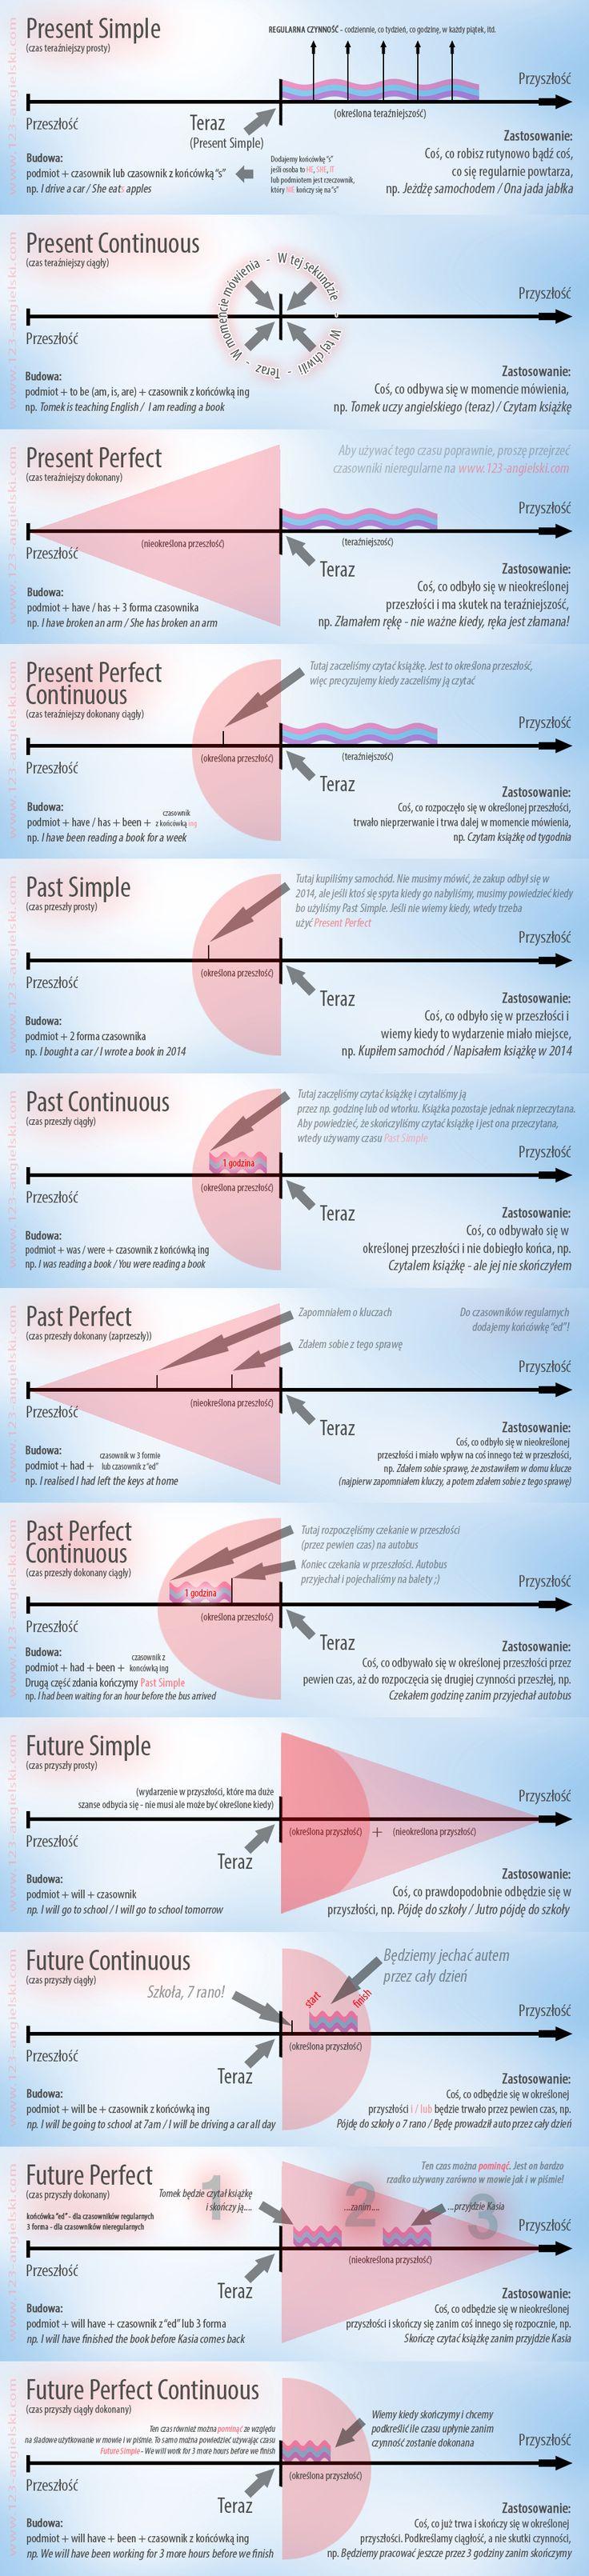 present simple, past simple, future simple, past continuous, present continuous